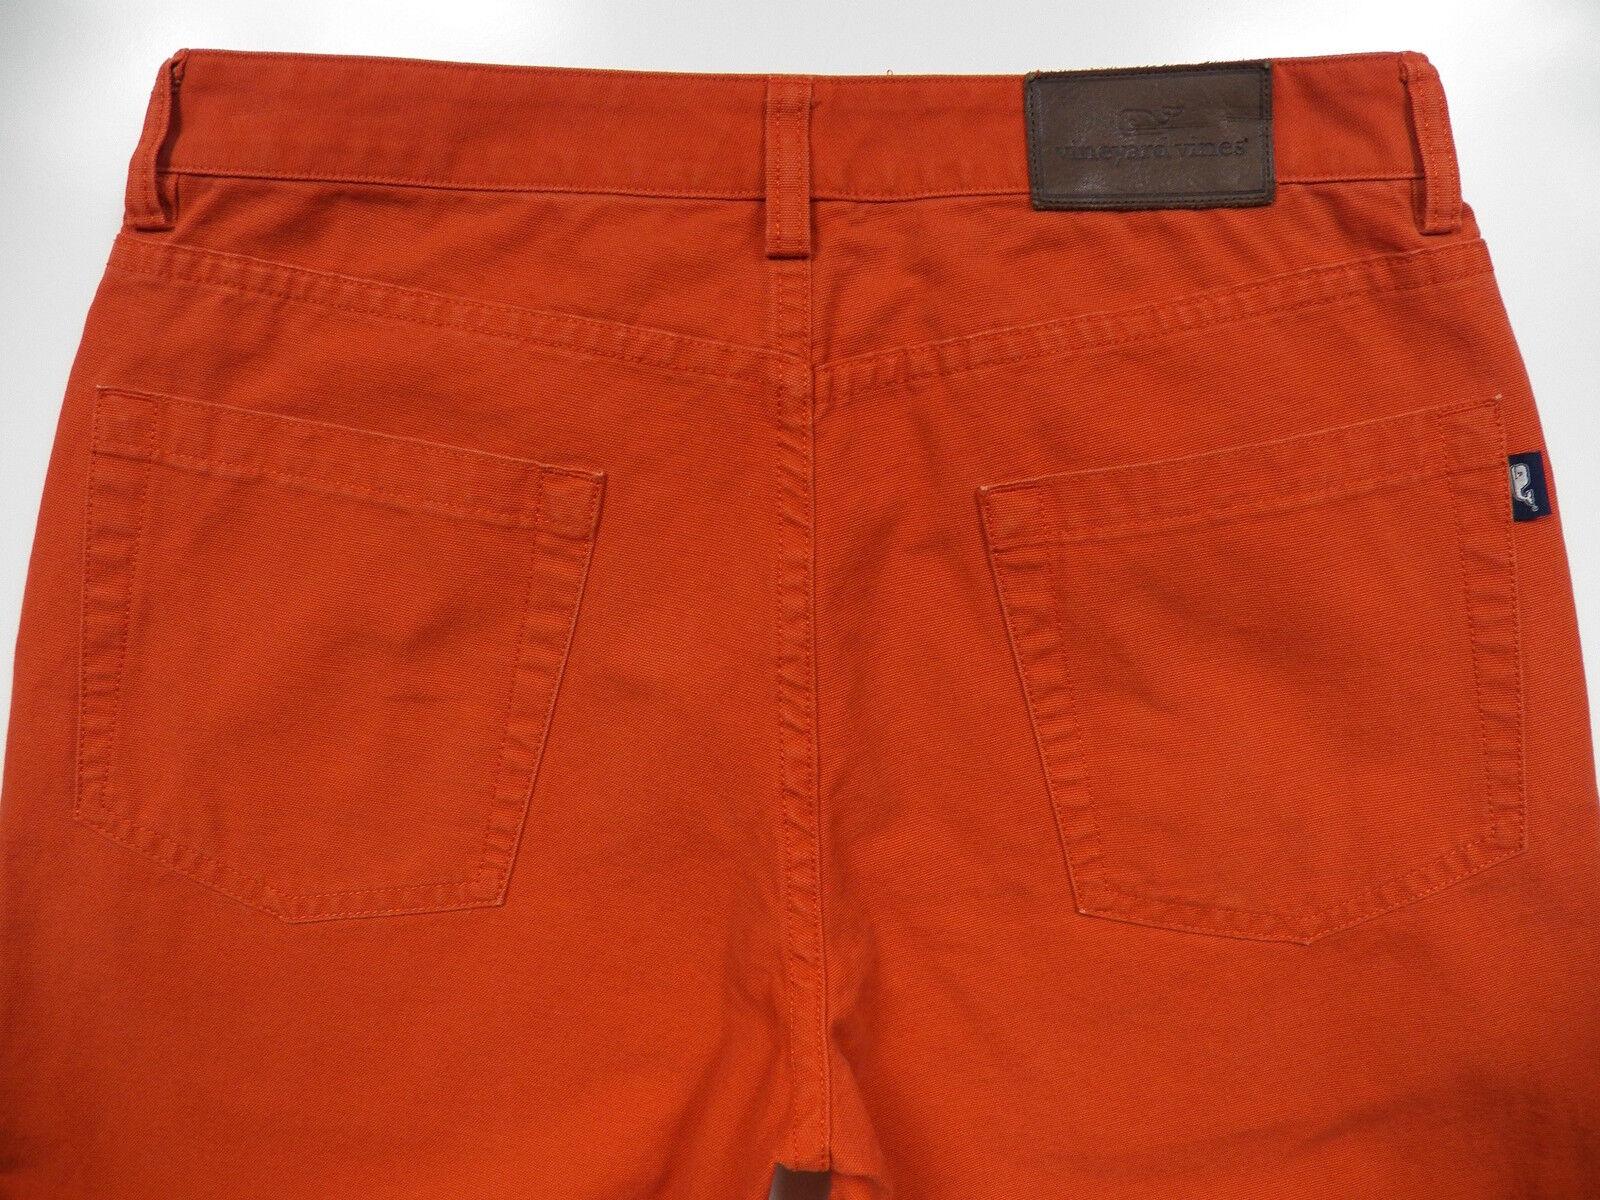 VINEYARD VINES MEN 30 X 32 CASUAL CANVAS PANTS STYLISH orange LEATHER WHALE LOGO